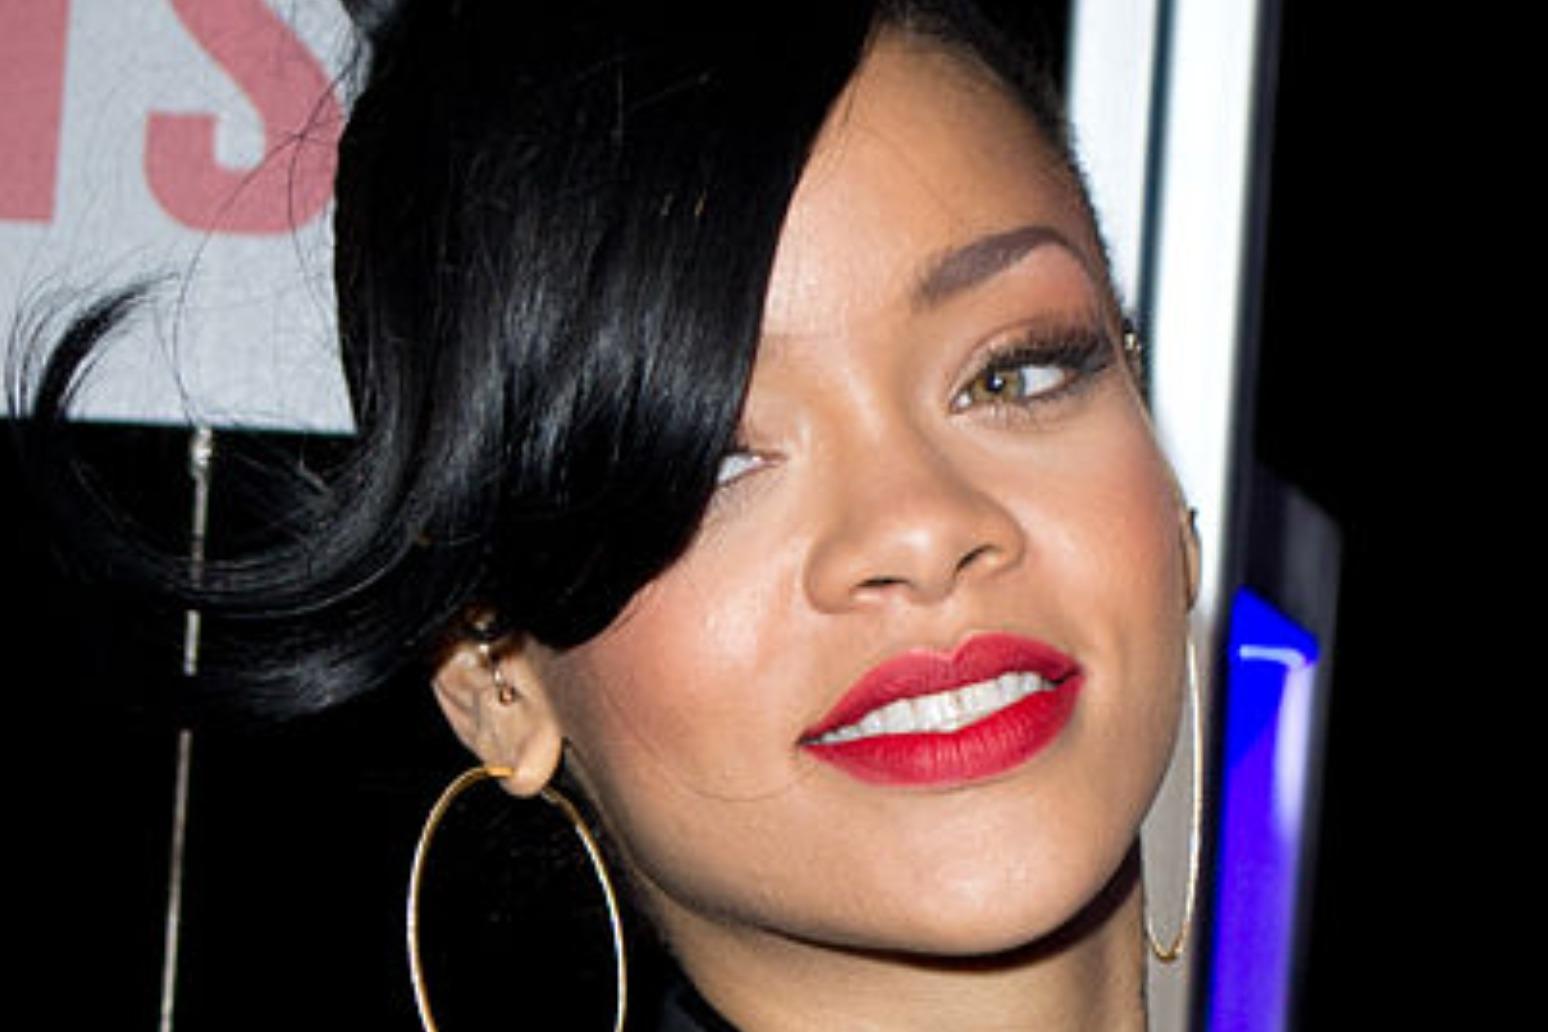 Forbes magazine says Rihanna is officially a billionaire